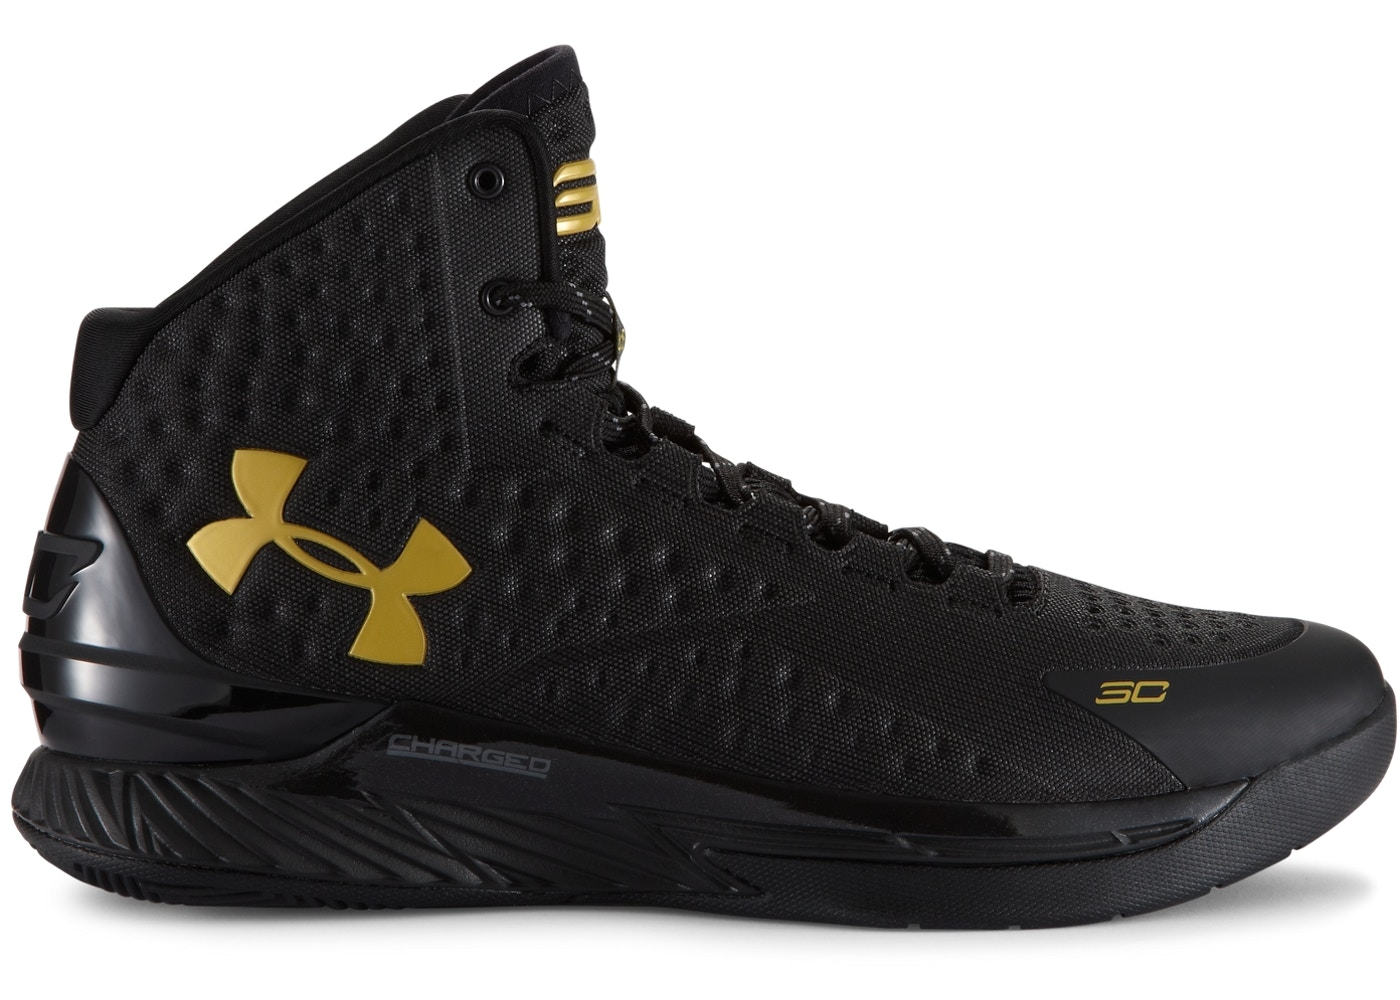 9124e50efc33 UA Curry 1 Black and Gold Banner - 1258723-008